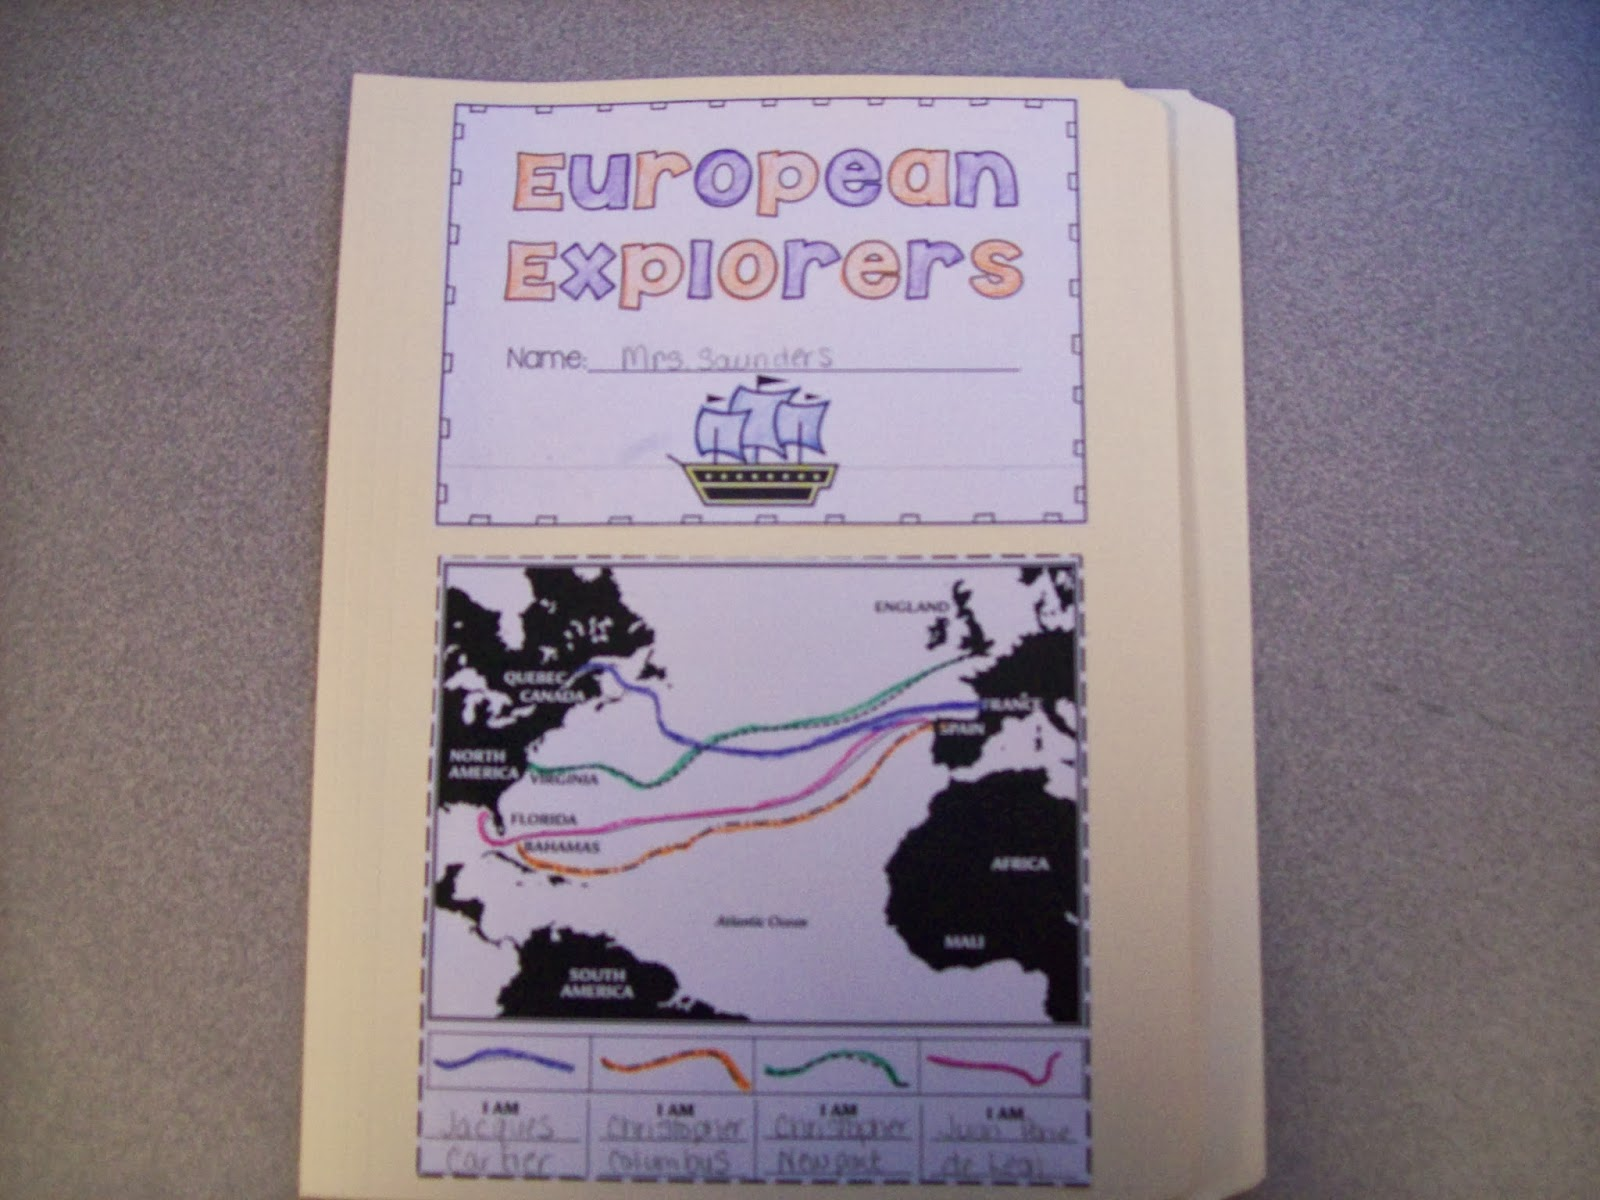 The Teaching Oasis Explorer S Lapbook